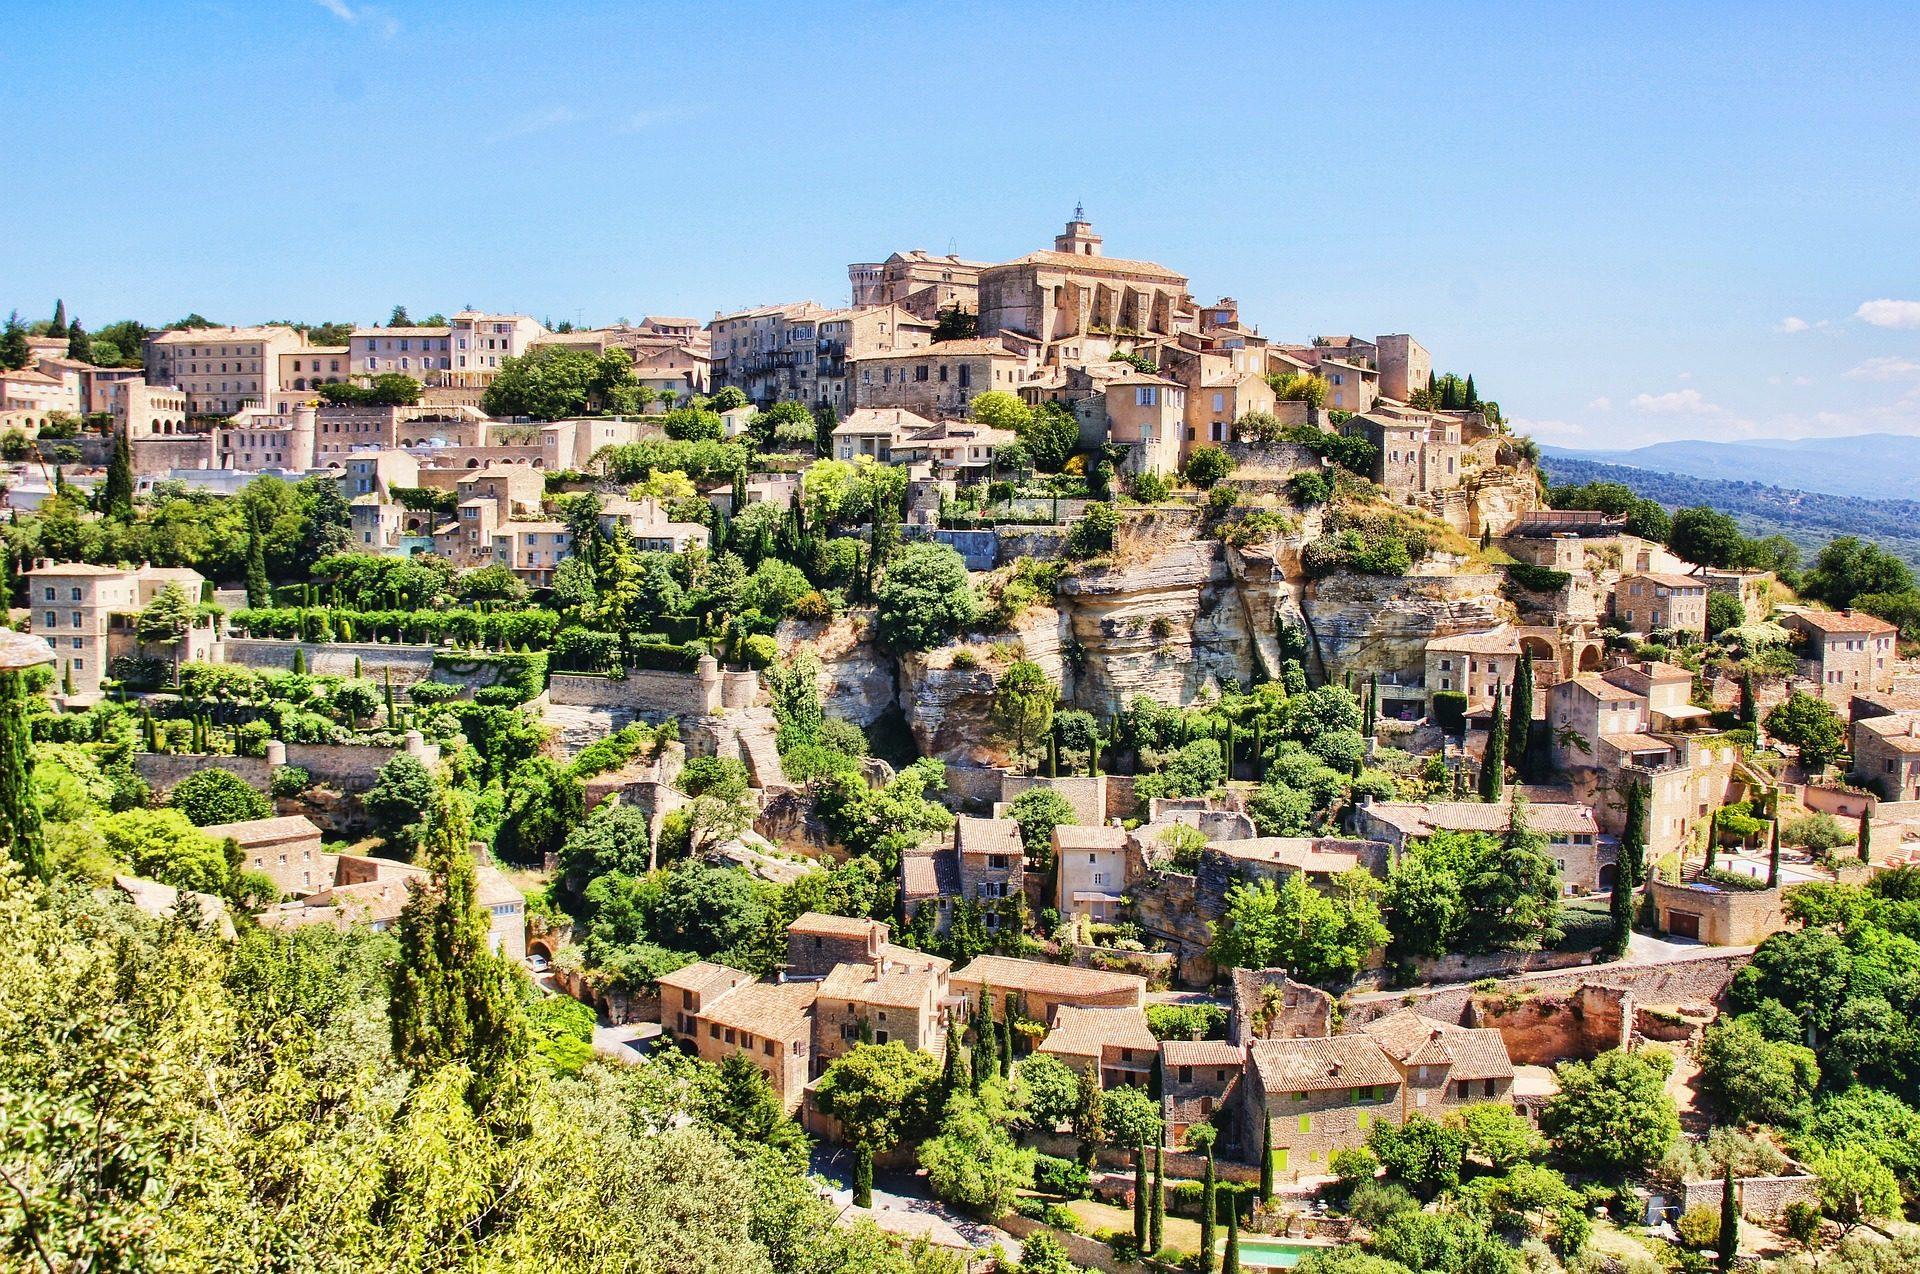 Dorf, Berg, Colina, Häuser, Provence, Villa, Frankreich - Wallpaper HD - Prof.-falken.com